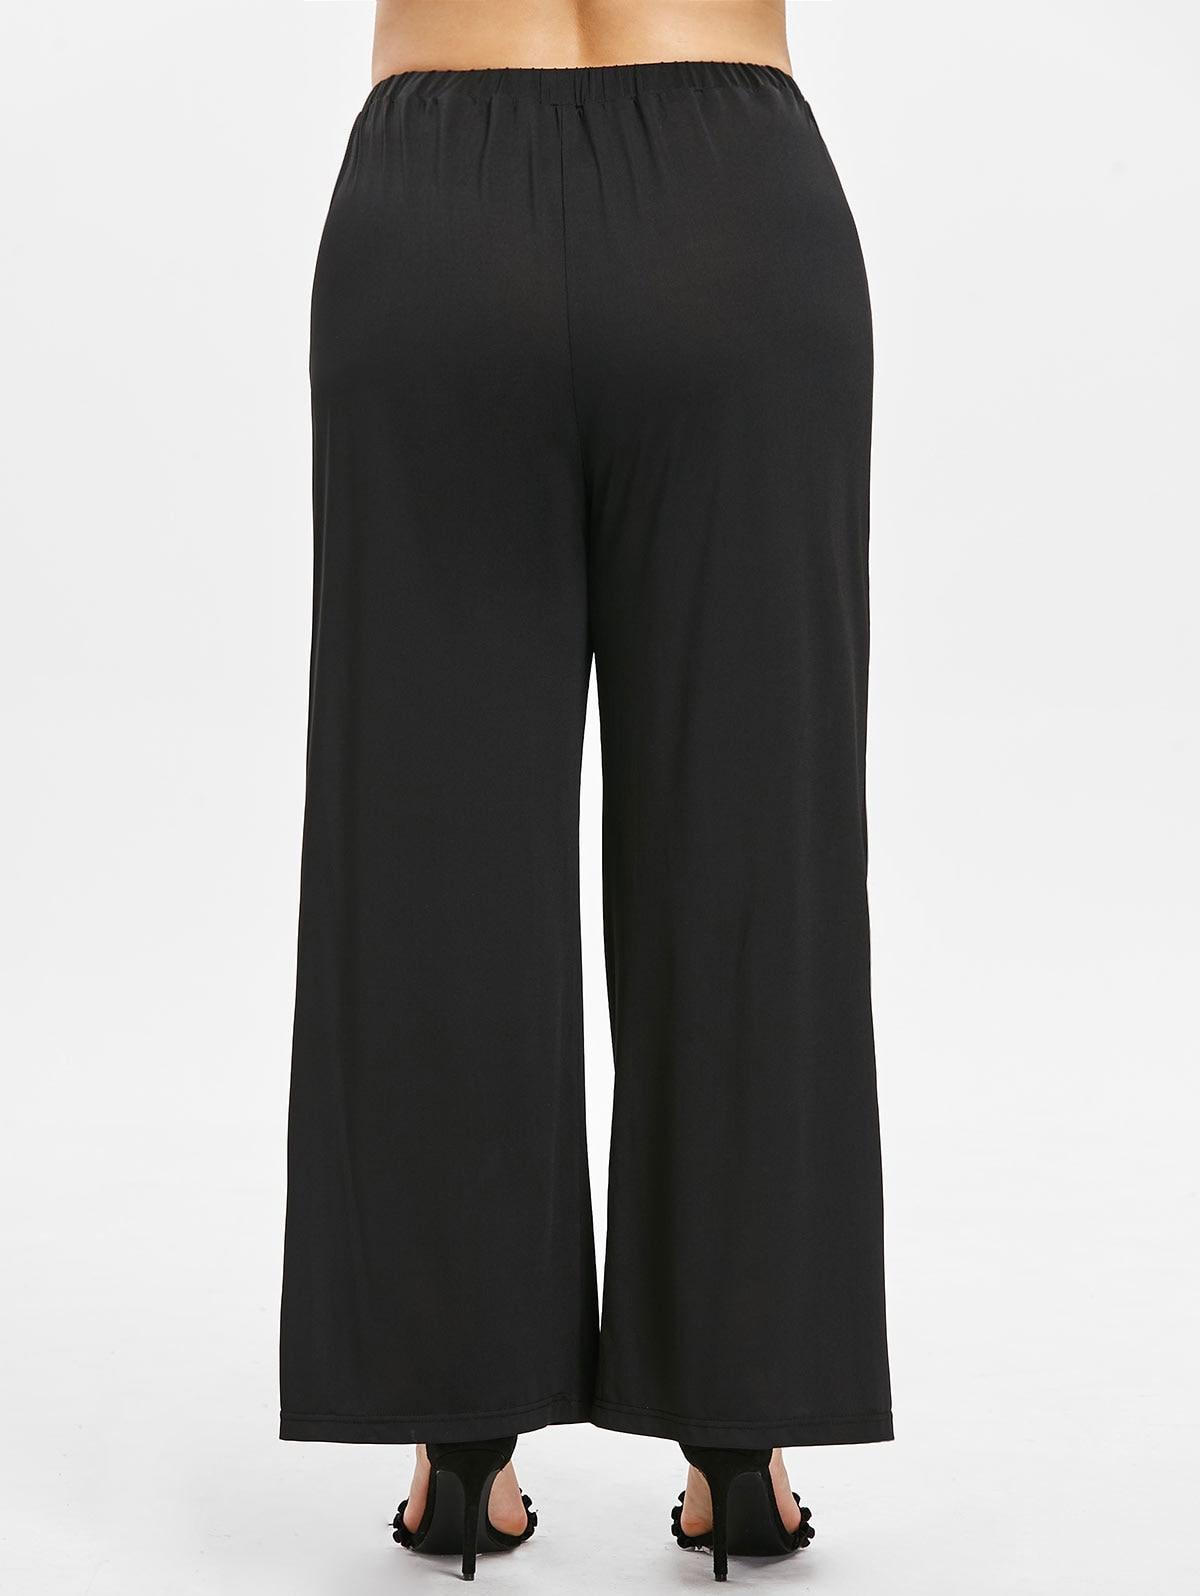 b87bf03d211 Plus Size Button Sides Wide Leg Pant Women Casual Loose Elastic Waist